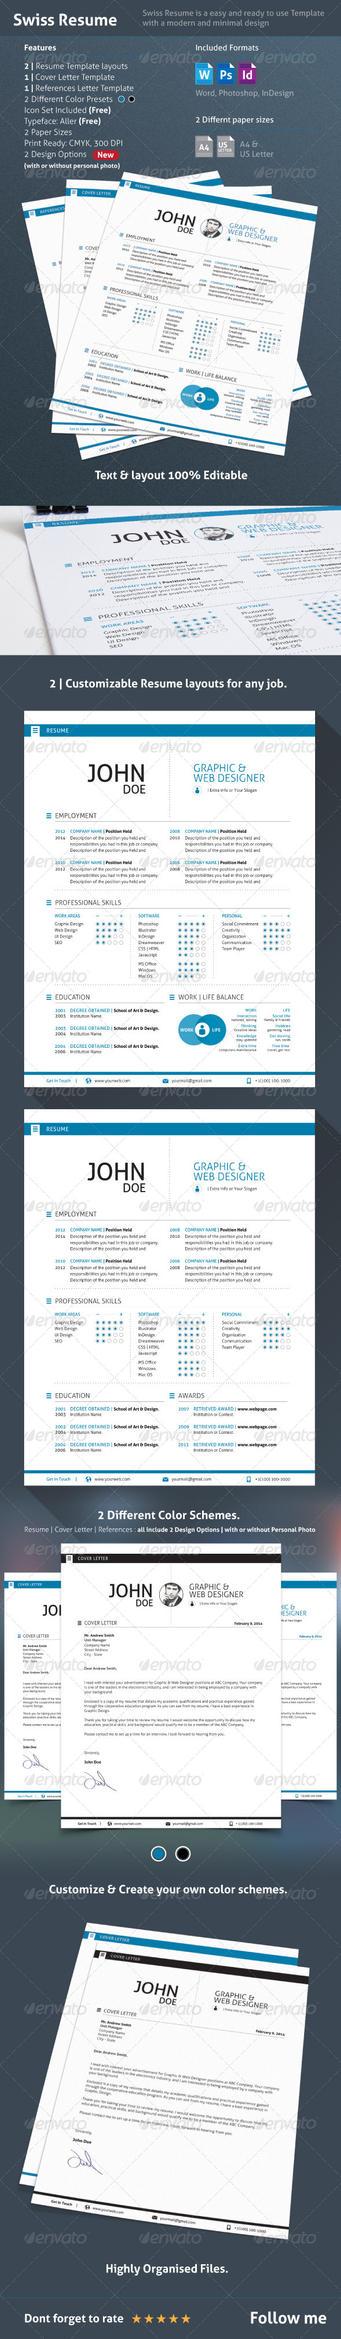 3 Piece Swiss Style Resume / CV by Dee-A